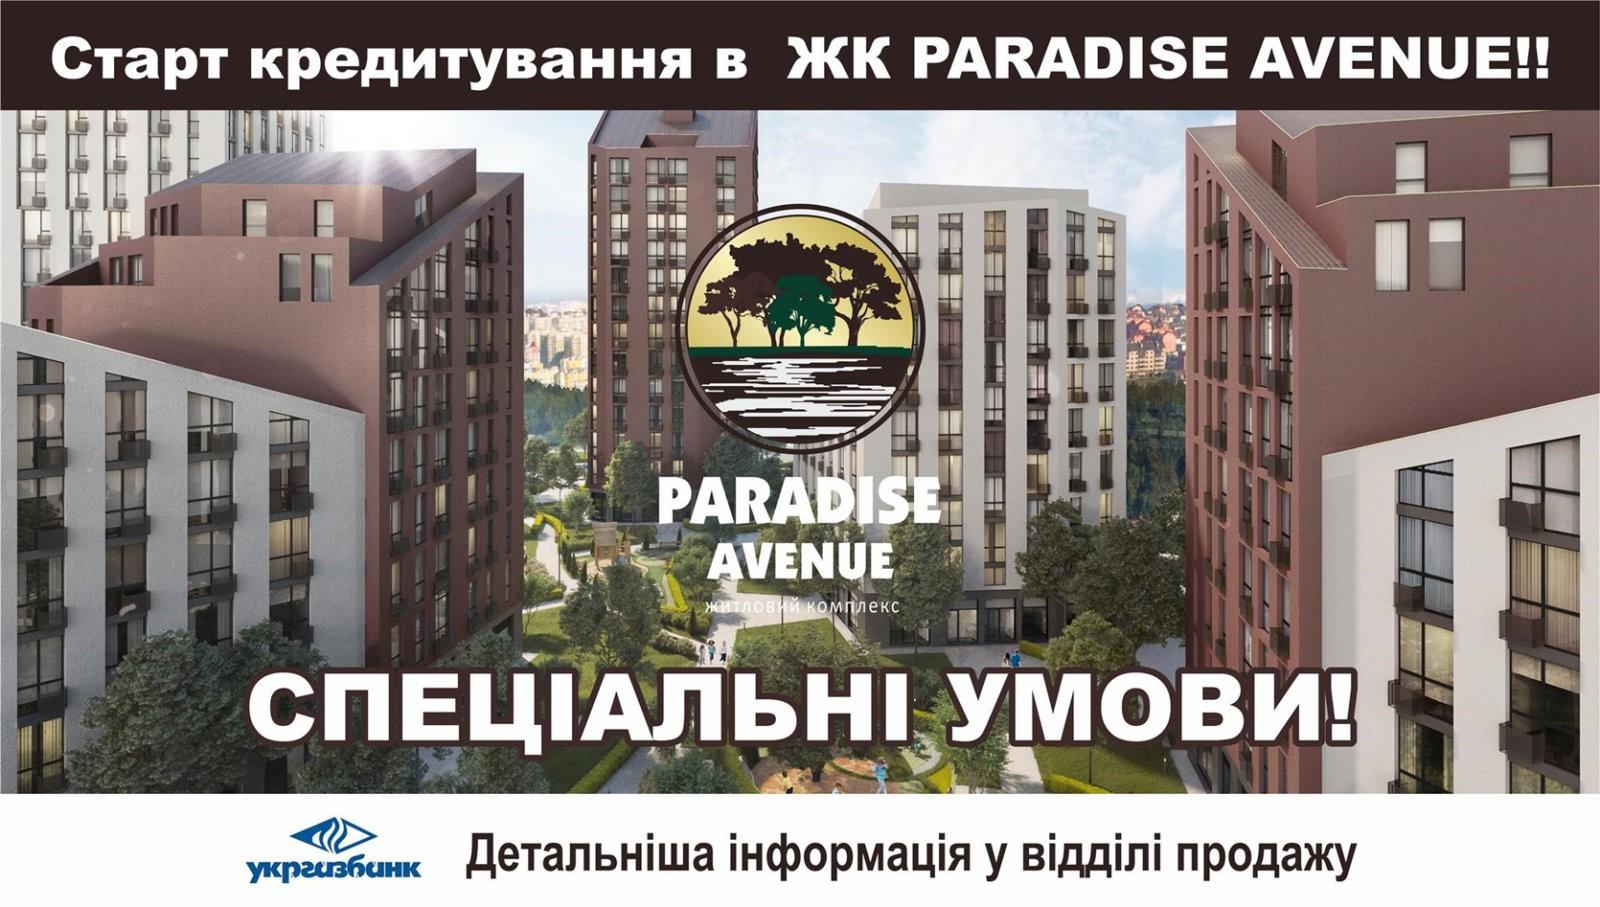 СТАРТ КРЕДИТУВАННЯ В ЖК PARADISE AVENUE